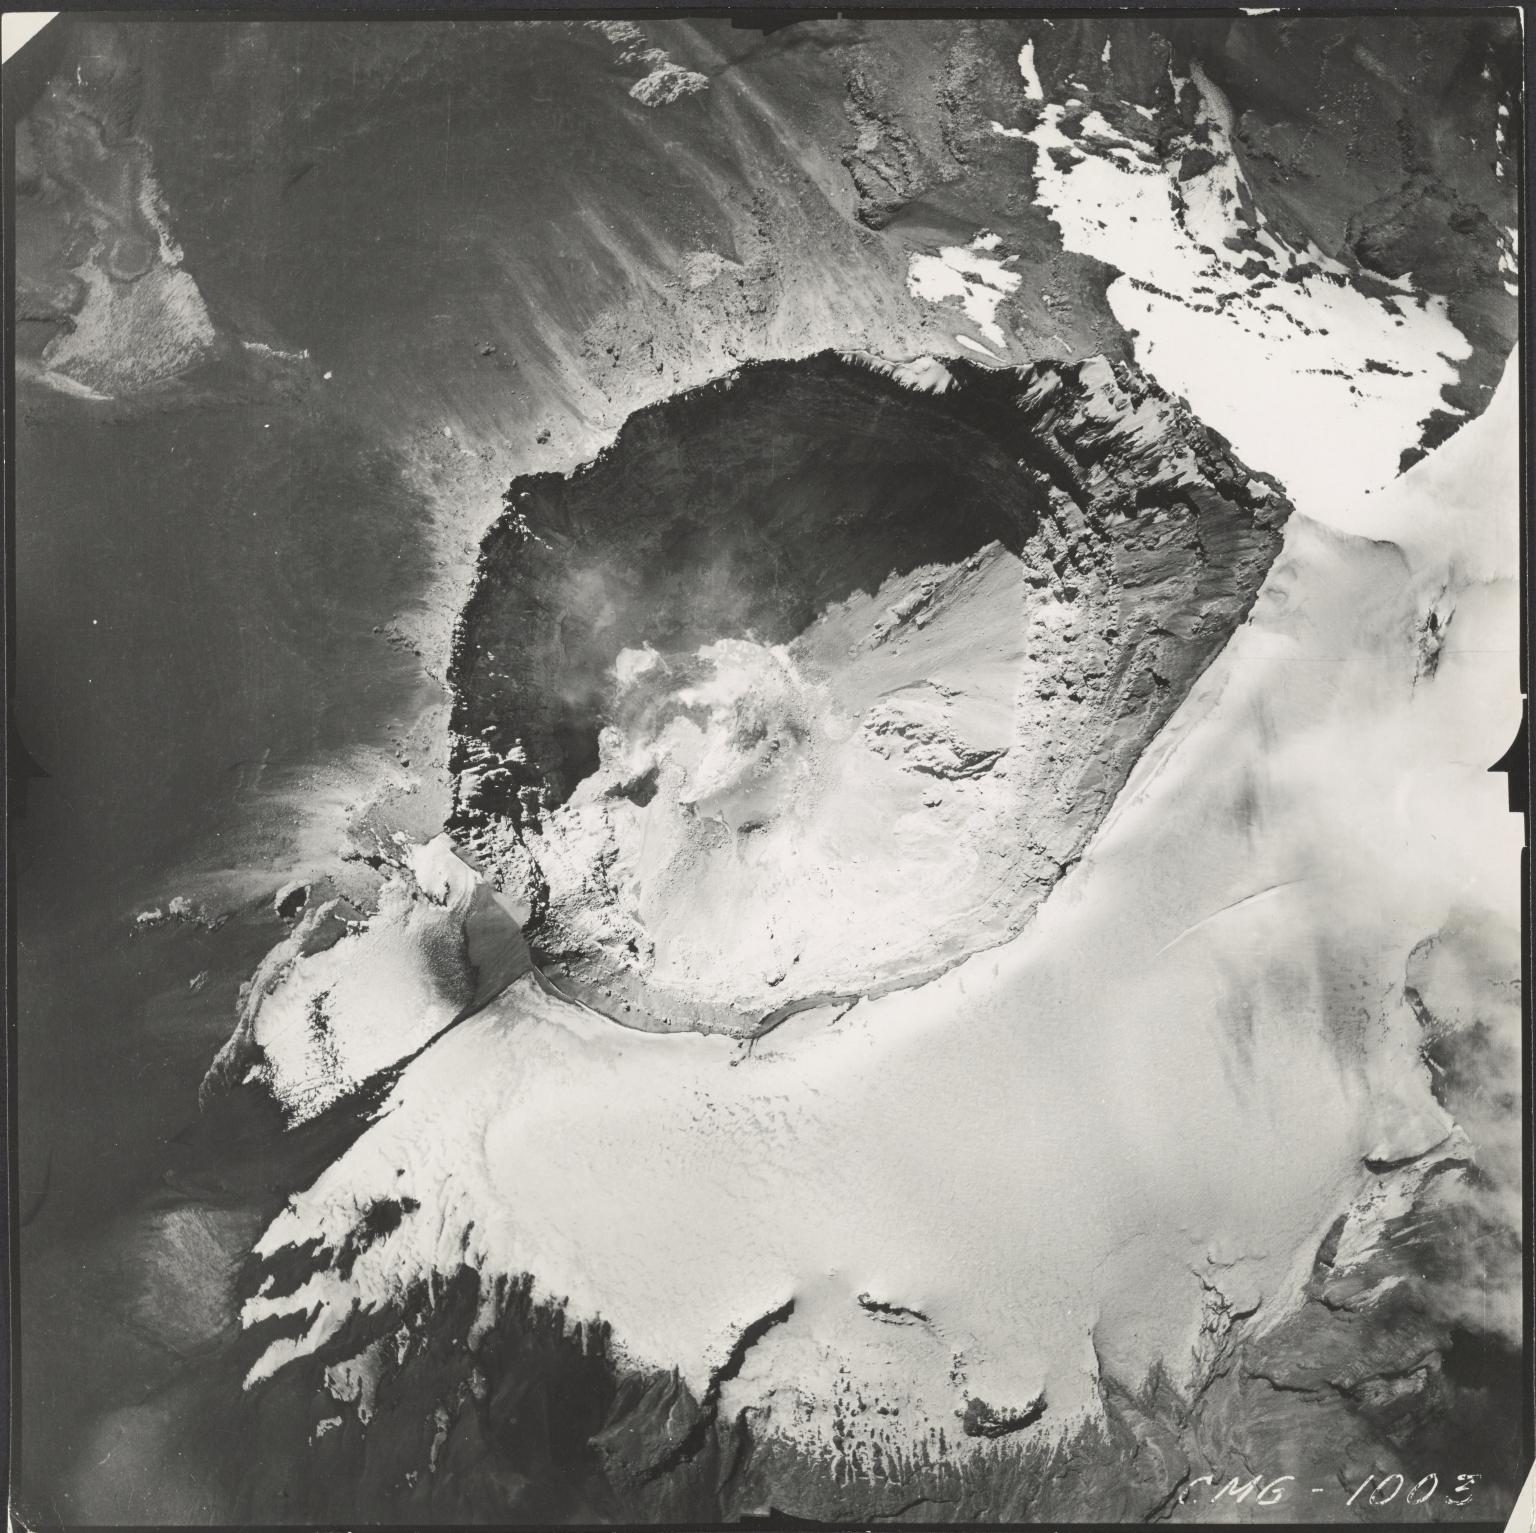 Popocatepetl Glacier, Mexico